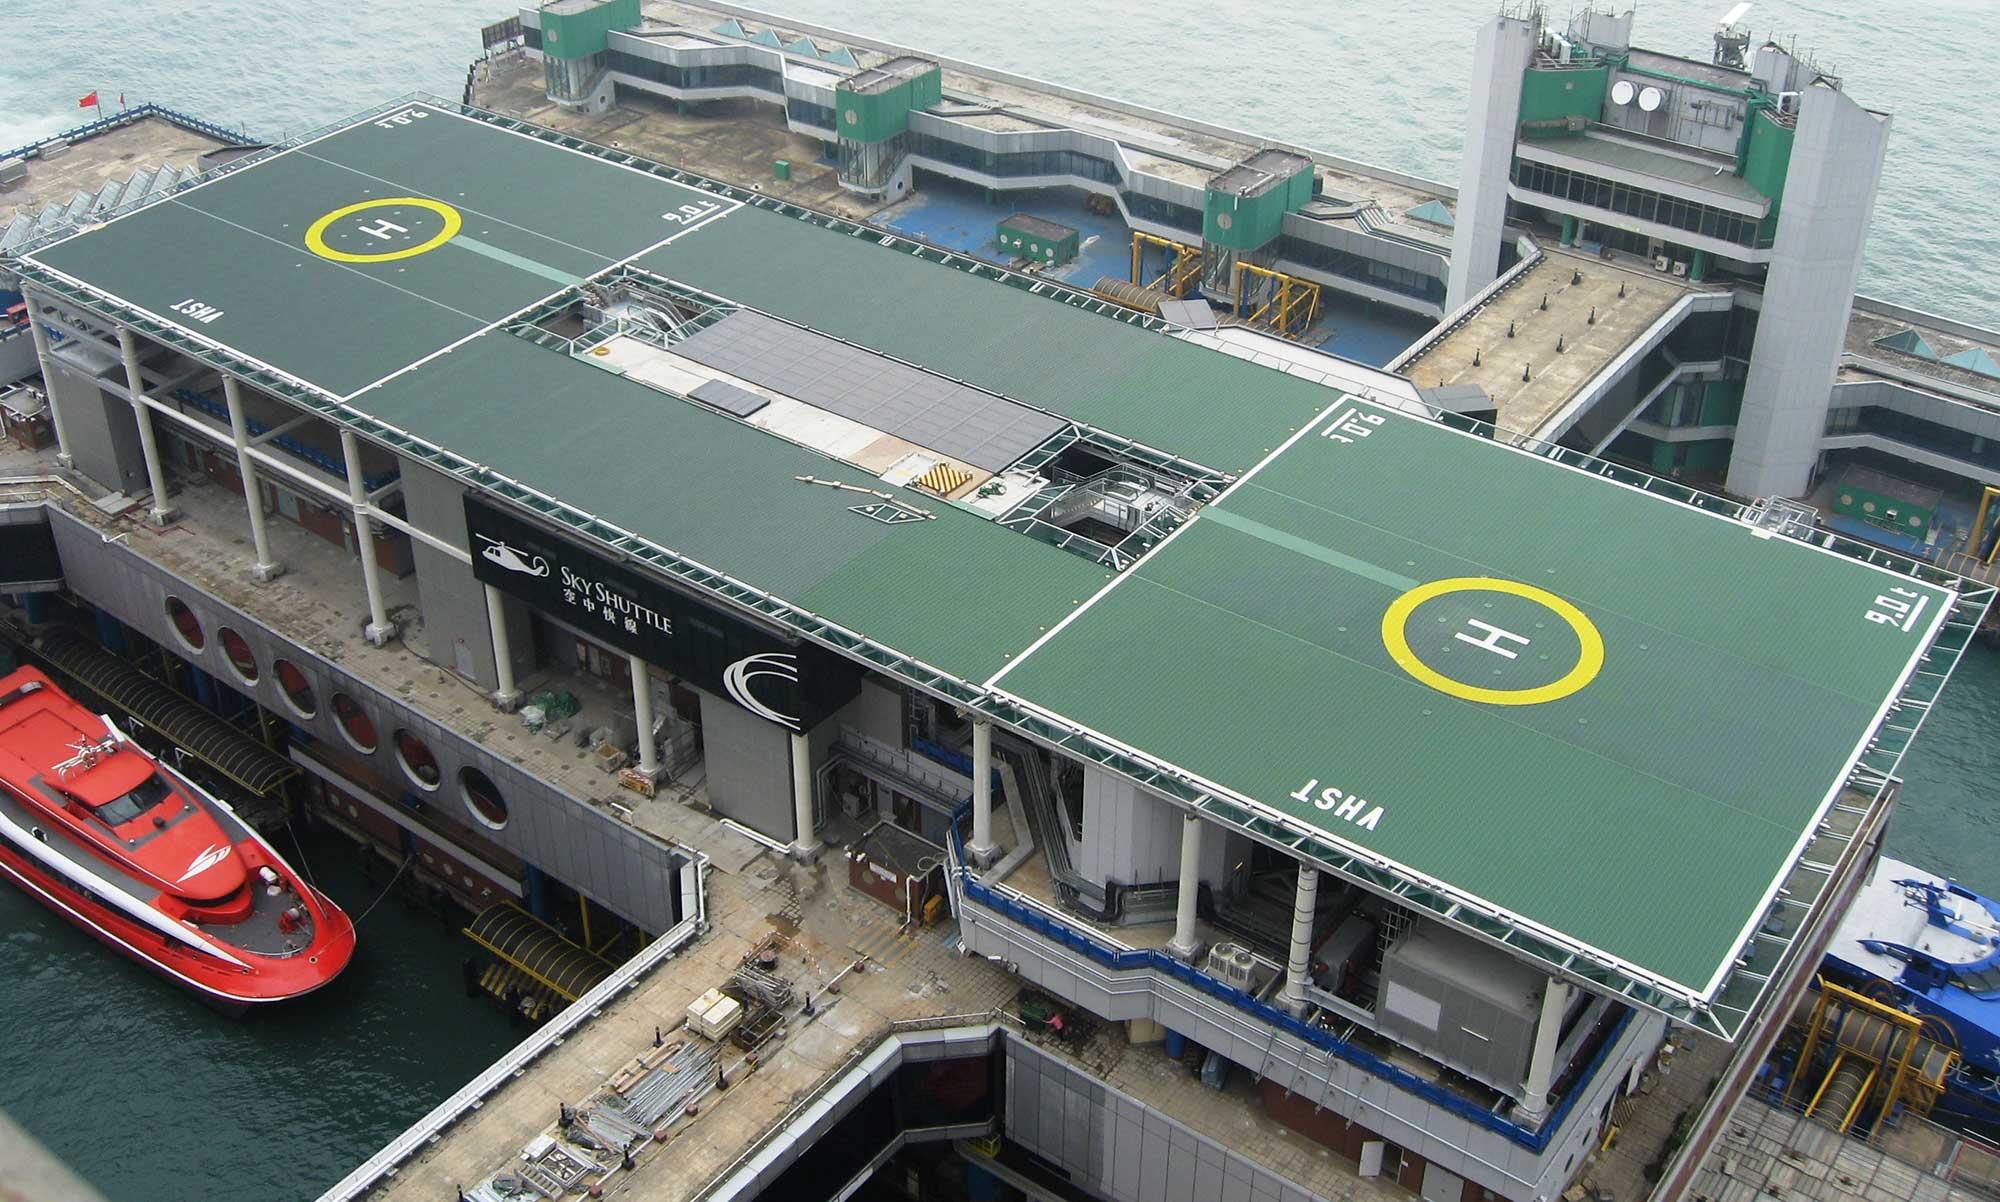 HK-MFT-astech-safety-helipad--world's-largest-helipad-110m-x-34m-with-dual-heliports